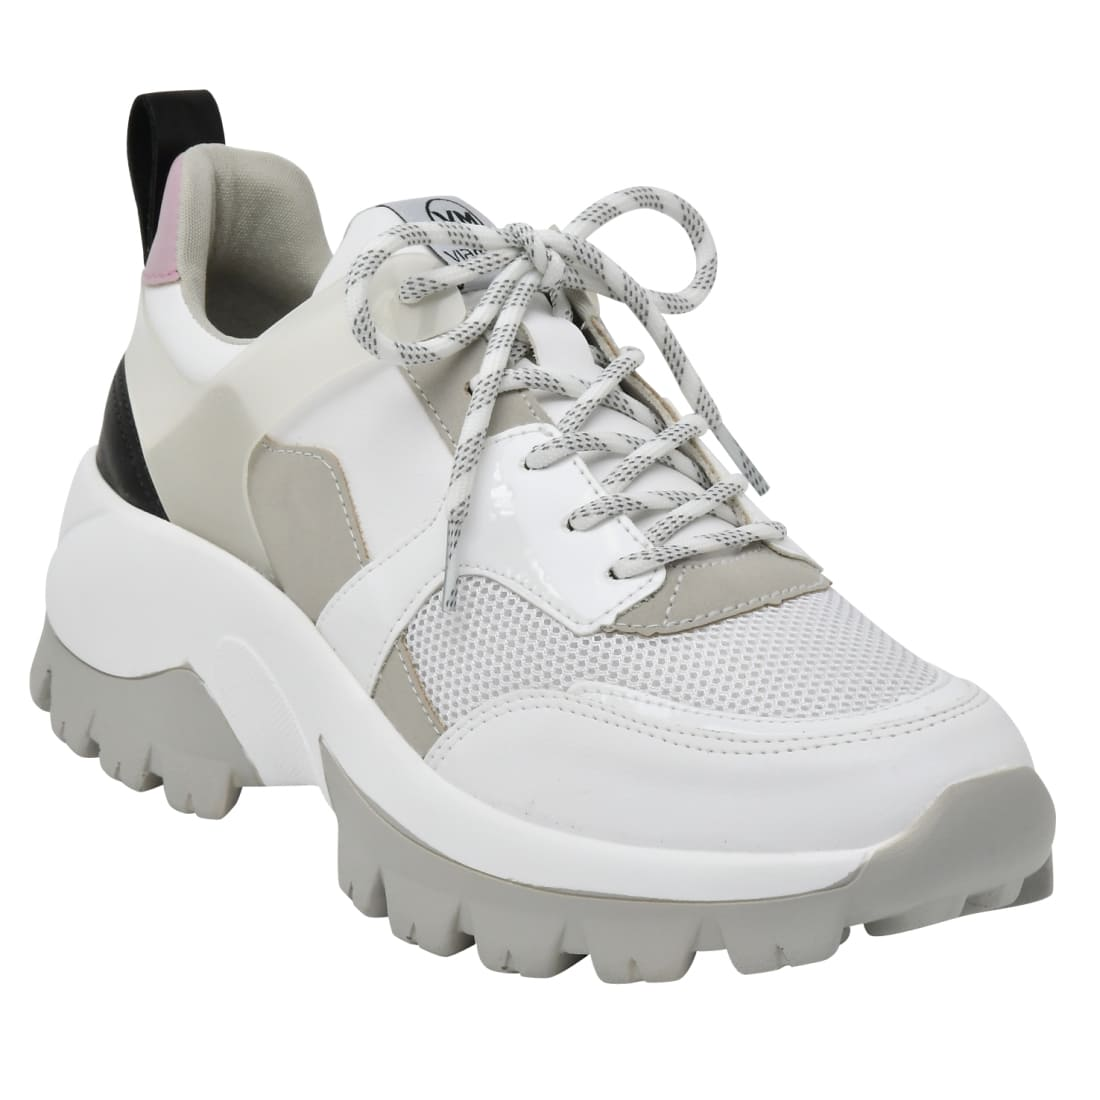 Tênis Via Marte Sneaker Branco/Cinza 20-7622